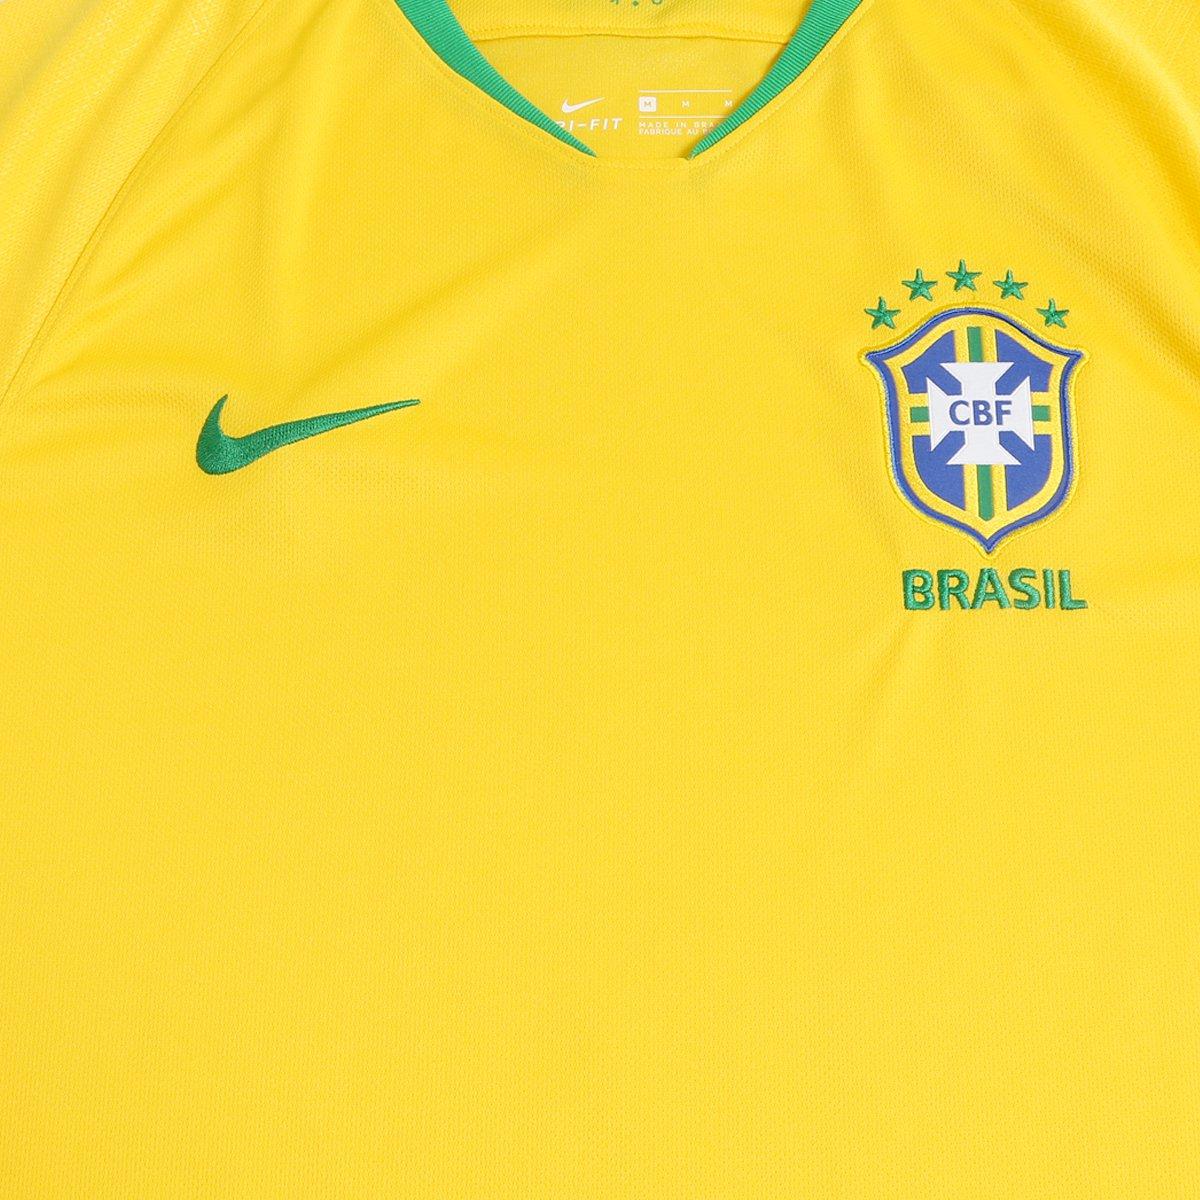 ... Camisa Seleção Brasil I 2018 nº 17 Fernandinho - Torcedor Nike  Masculina ... a1cdbd00eb77e